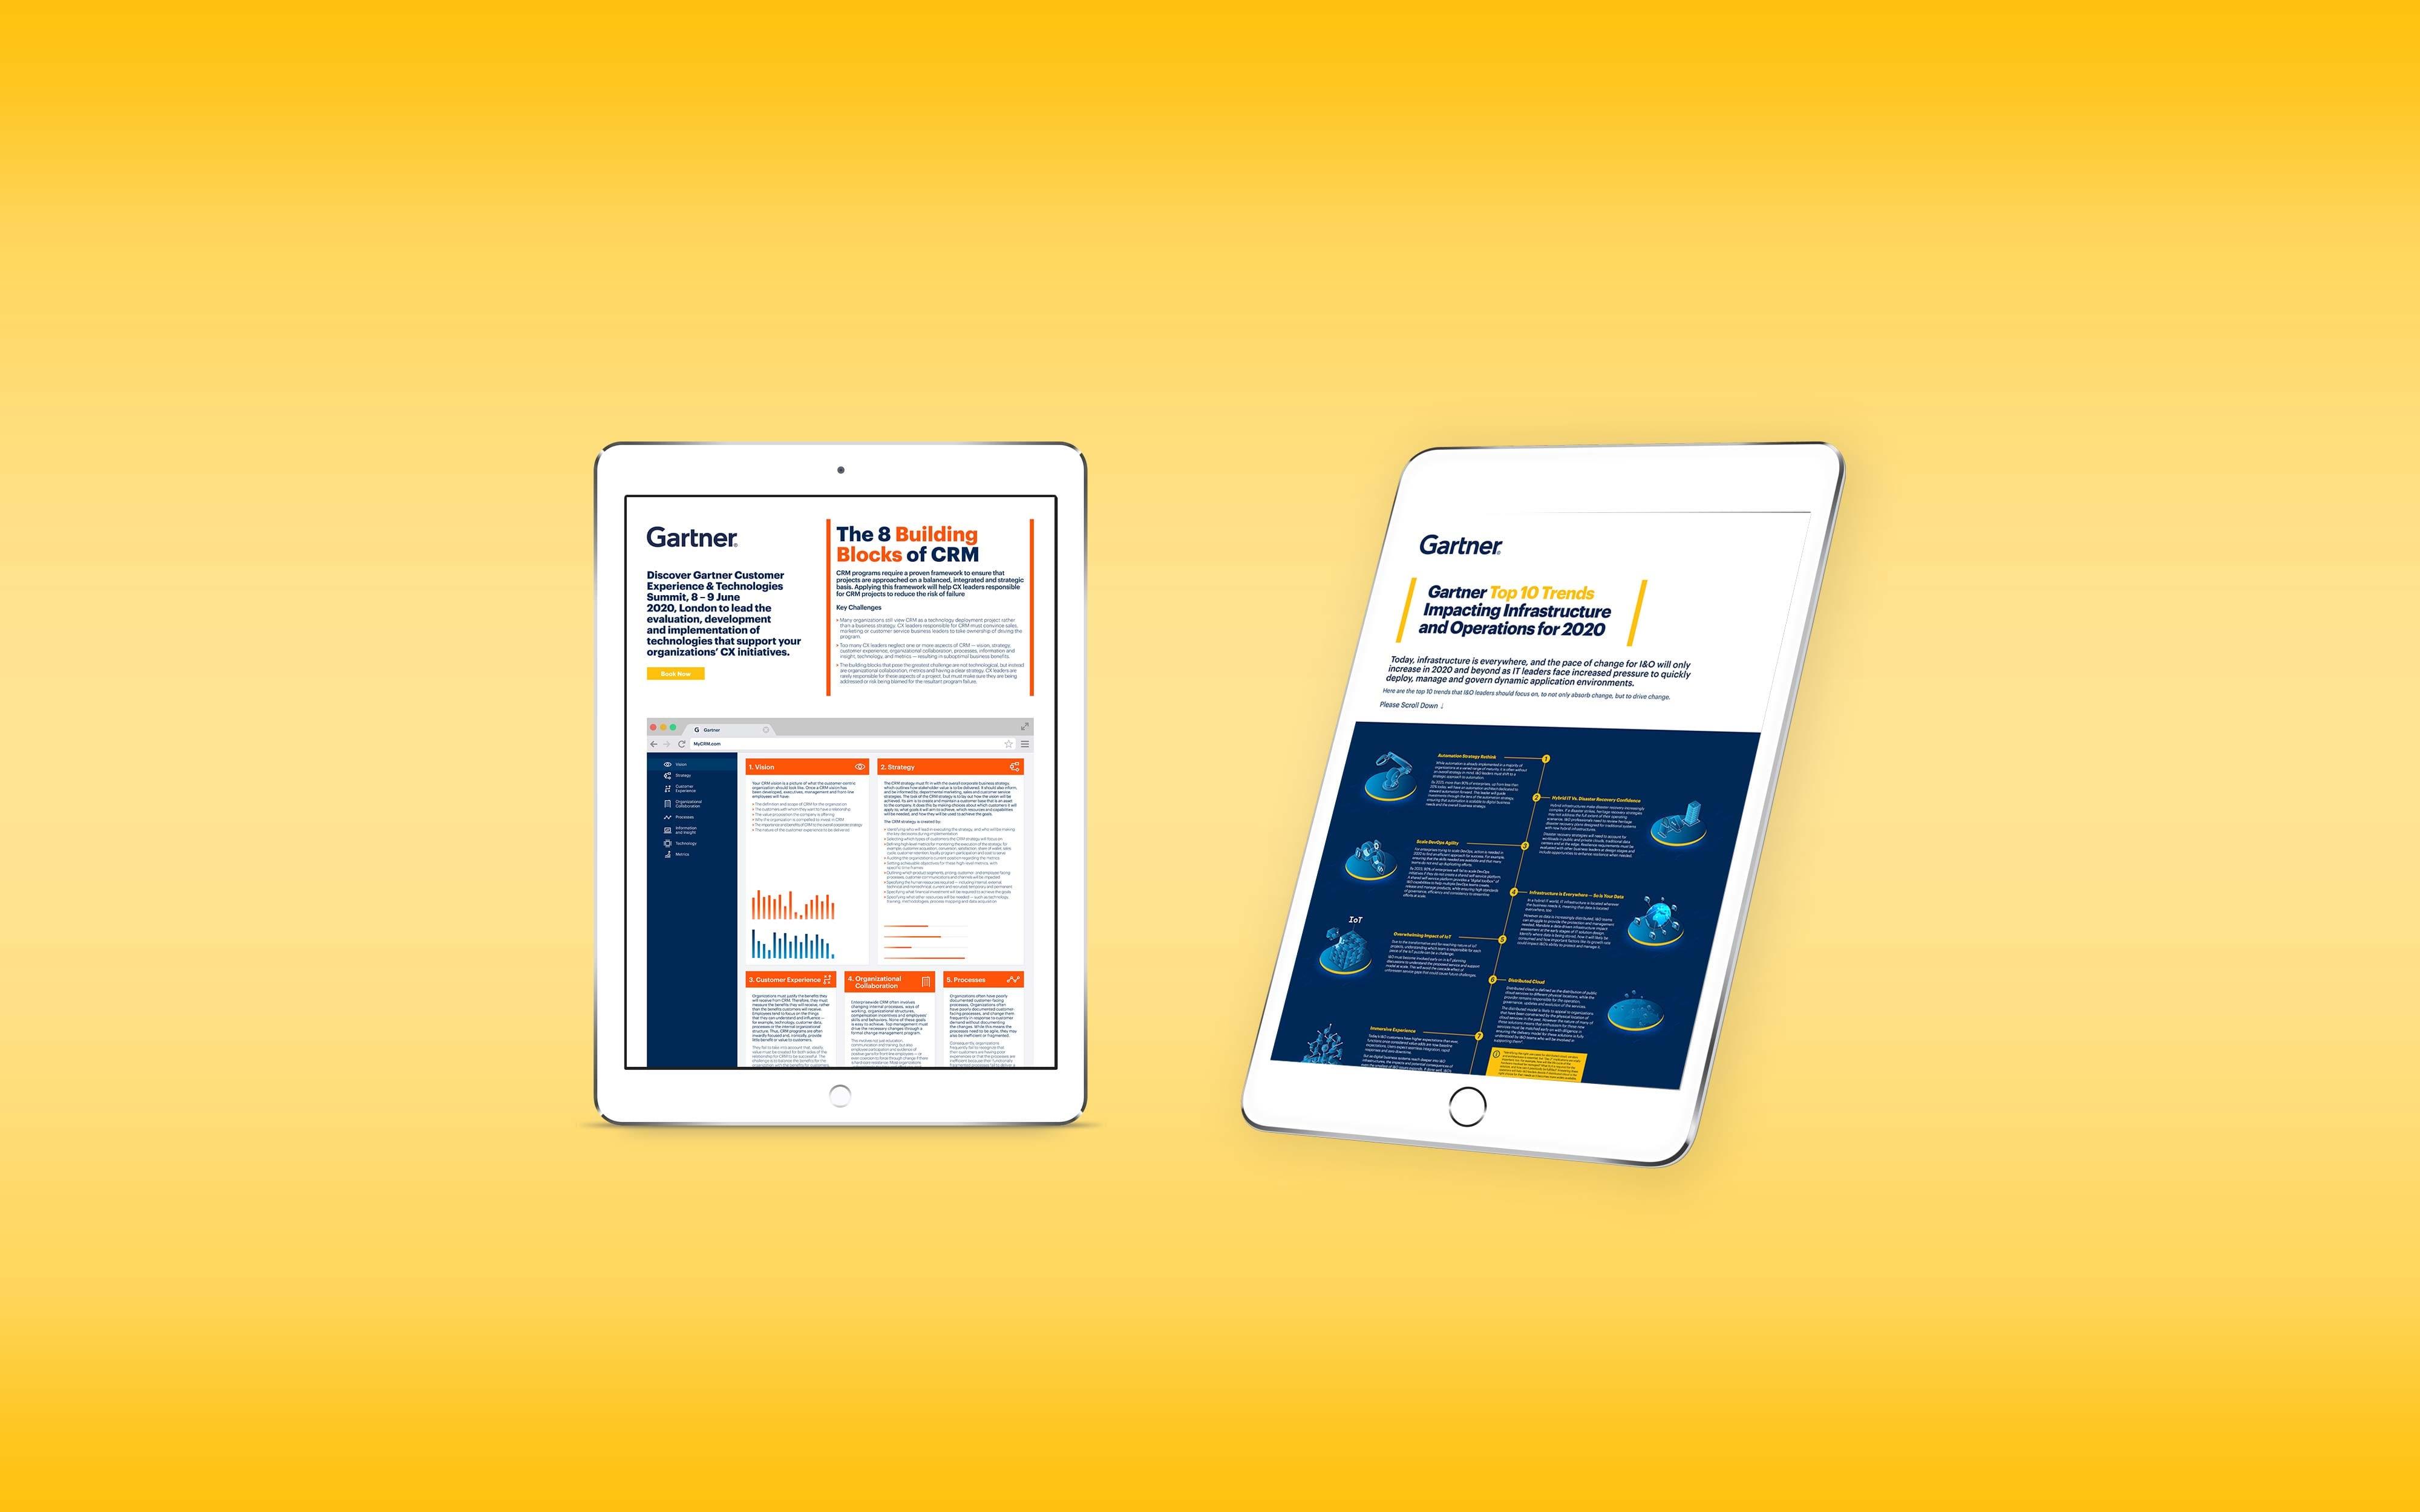 Gartner website tablet